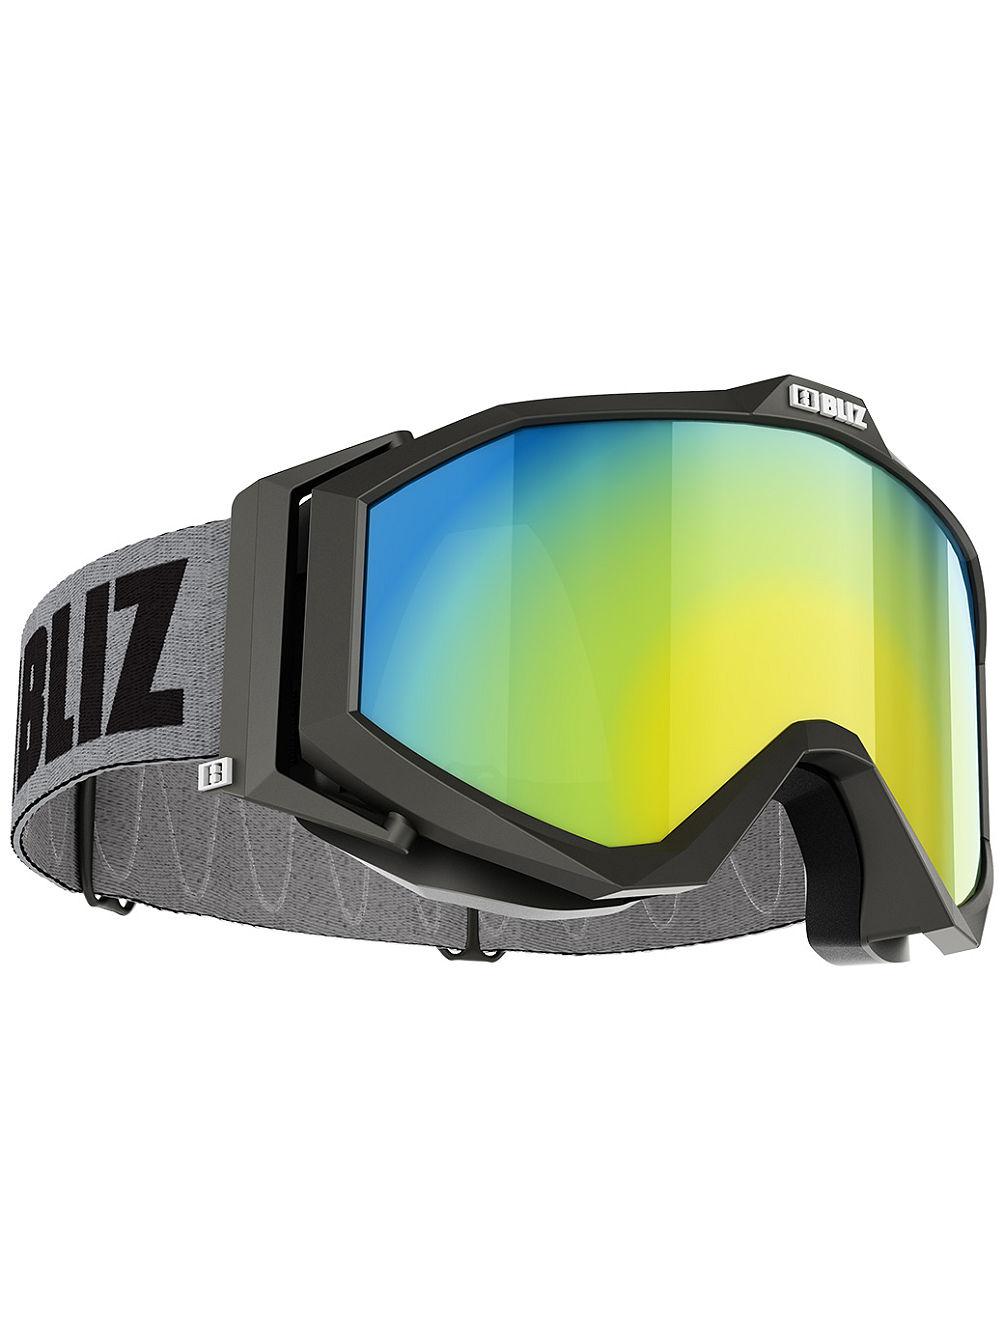 bliz-protective-sports-gear-edge-matt-black